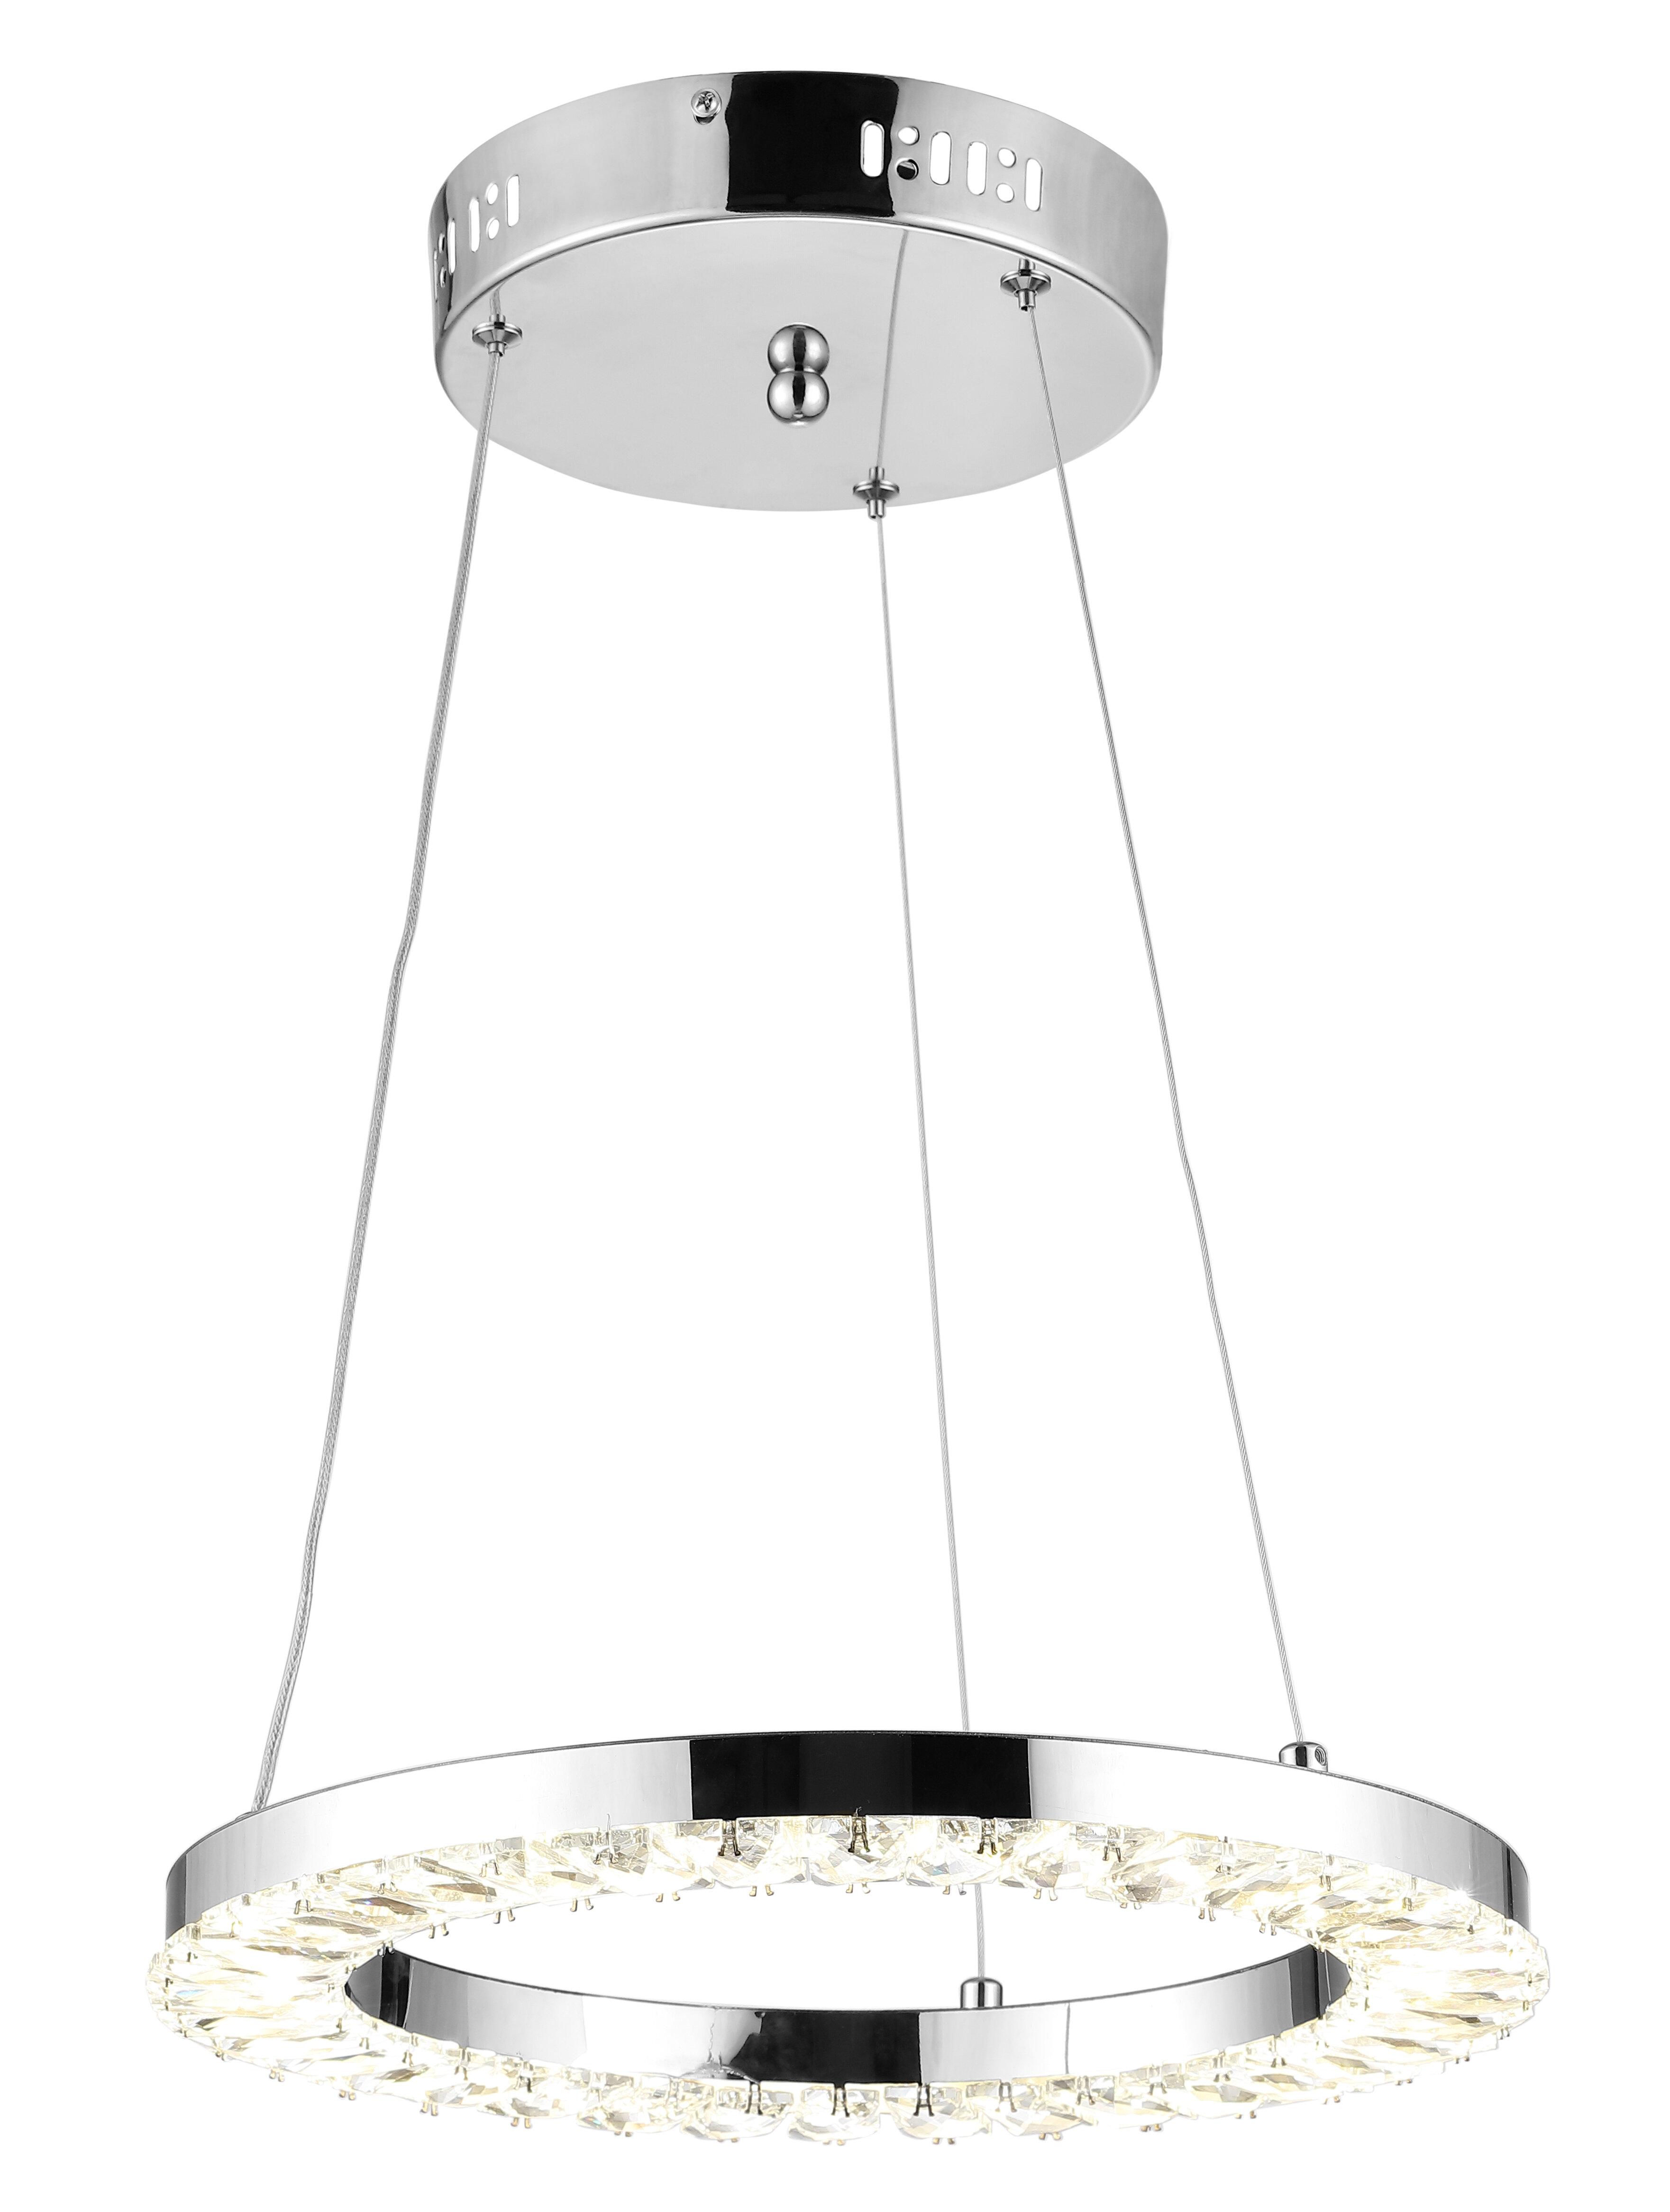 Ada Compliant Geometric Pendant Lighting You Ll Love In 2021 Wayfair